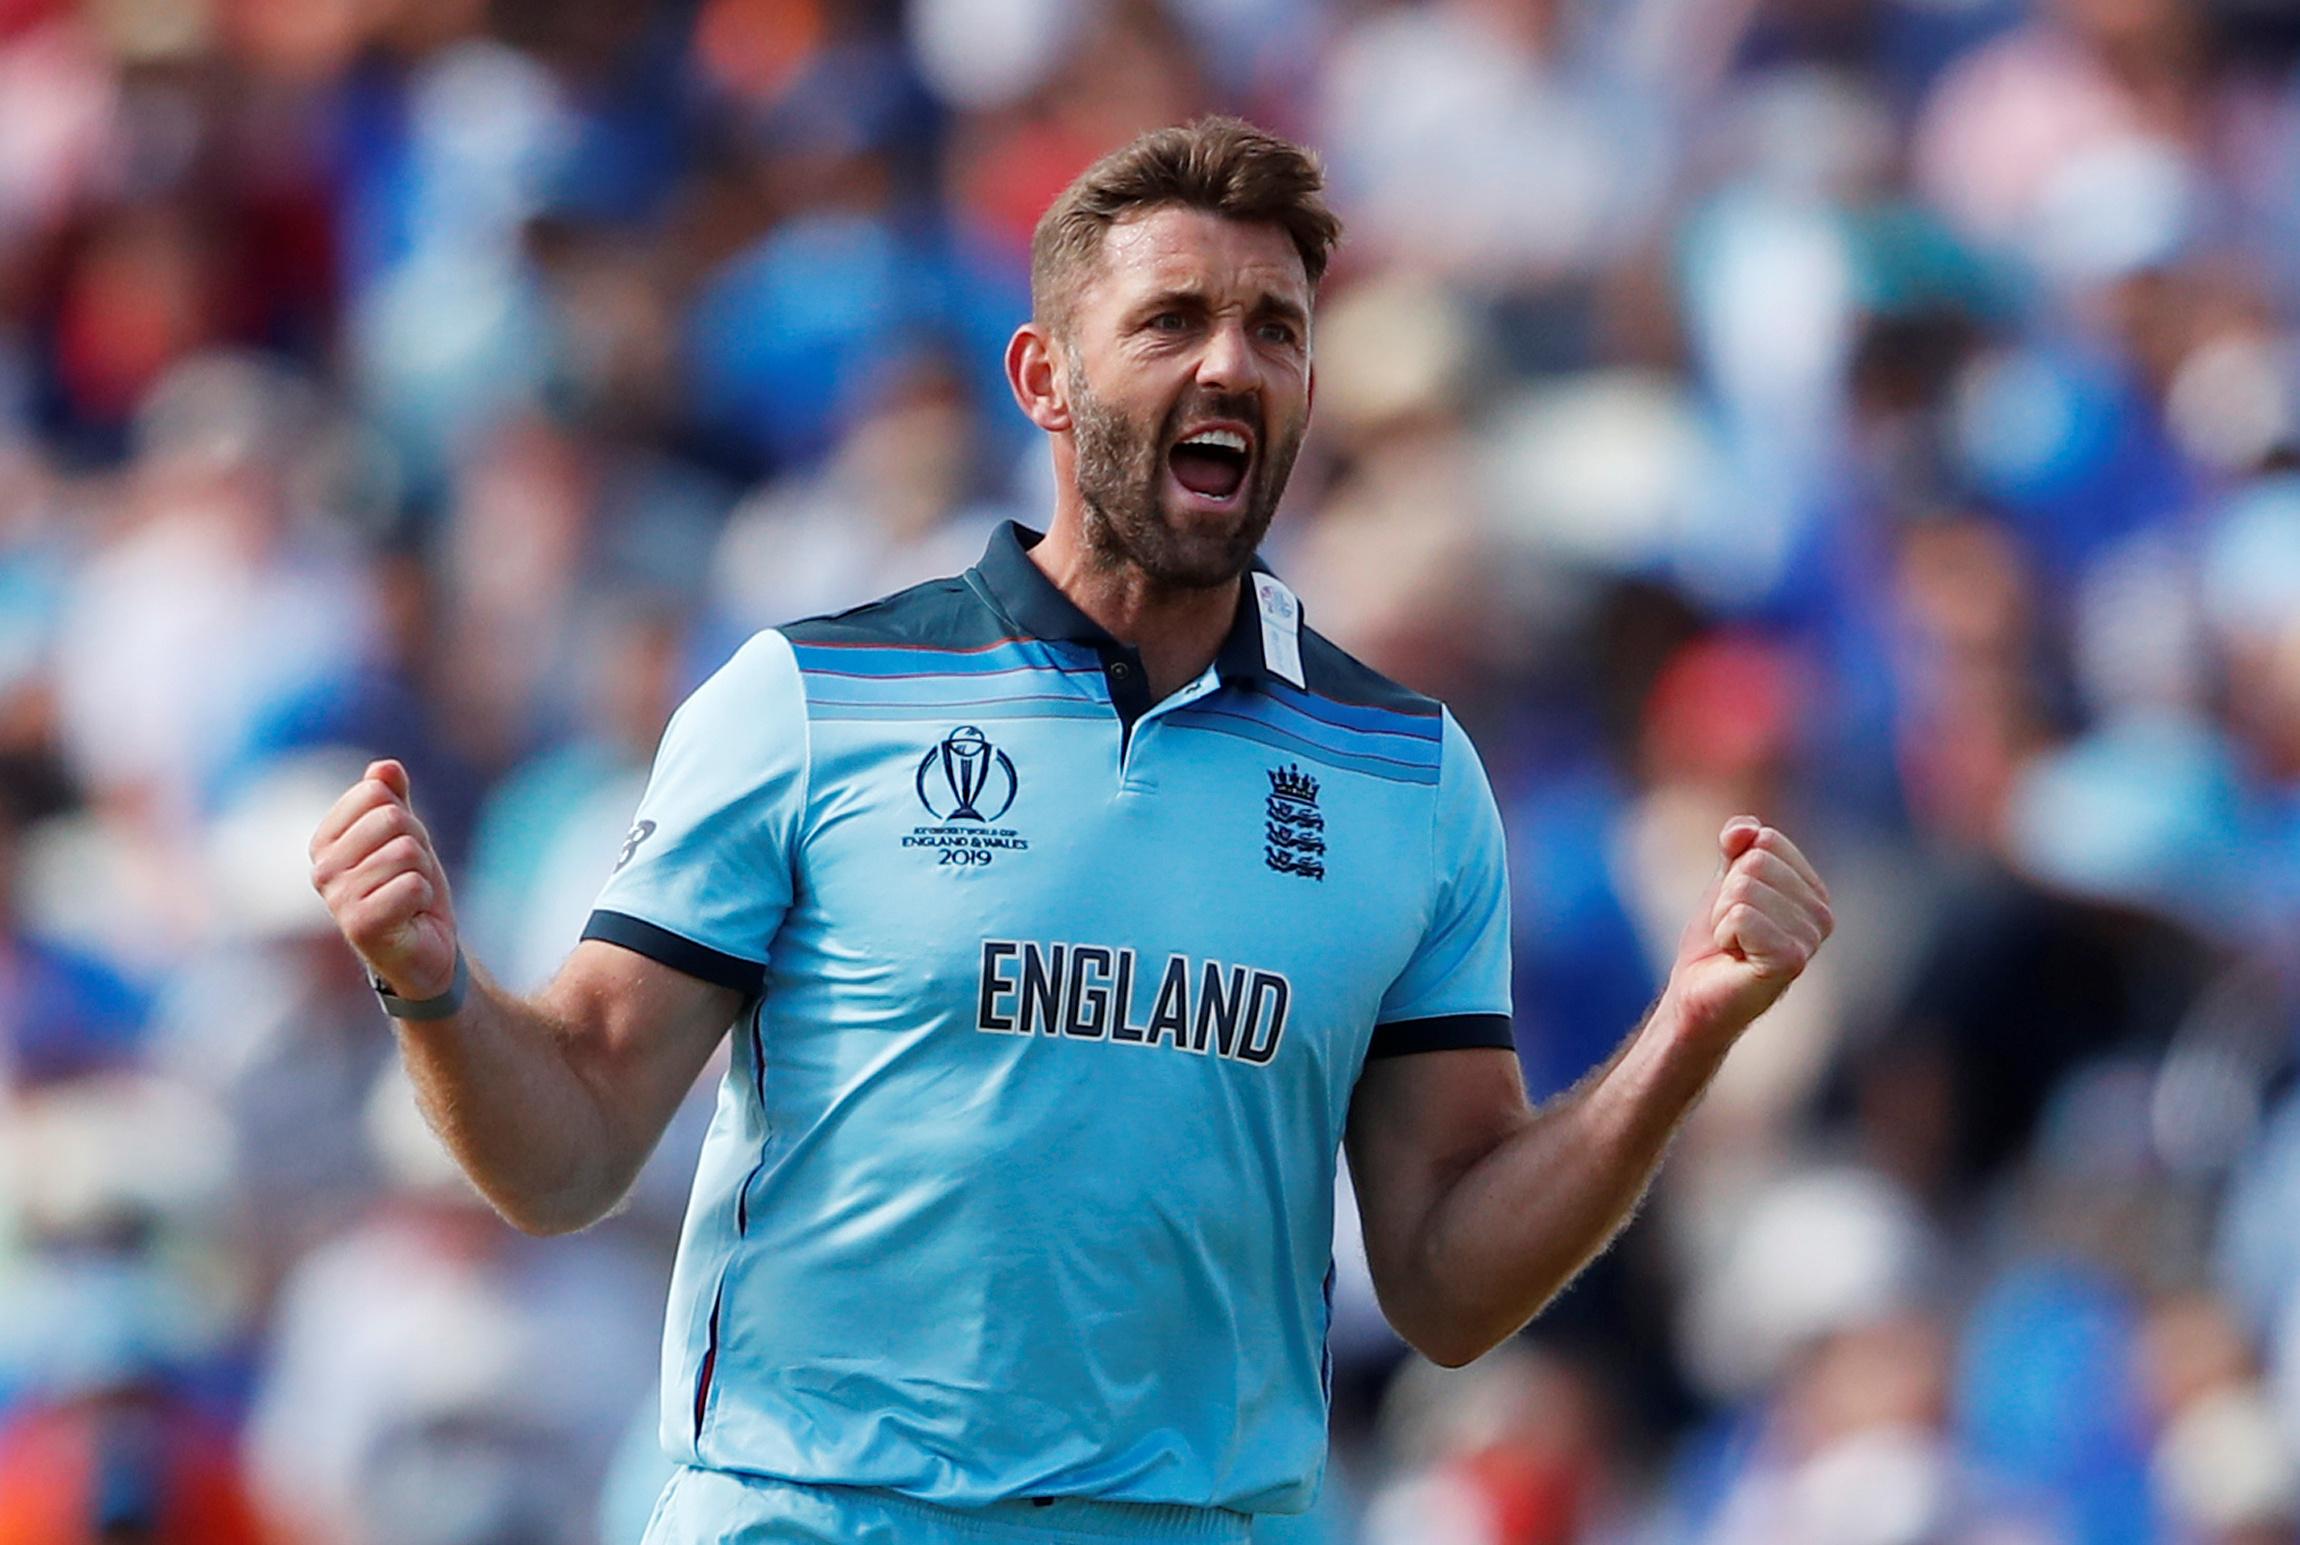 England's Liam Plunkett Images via Reuters/Andrew Boyers